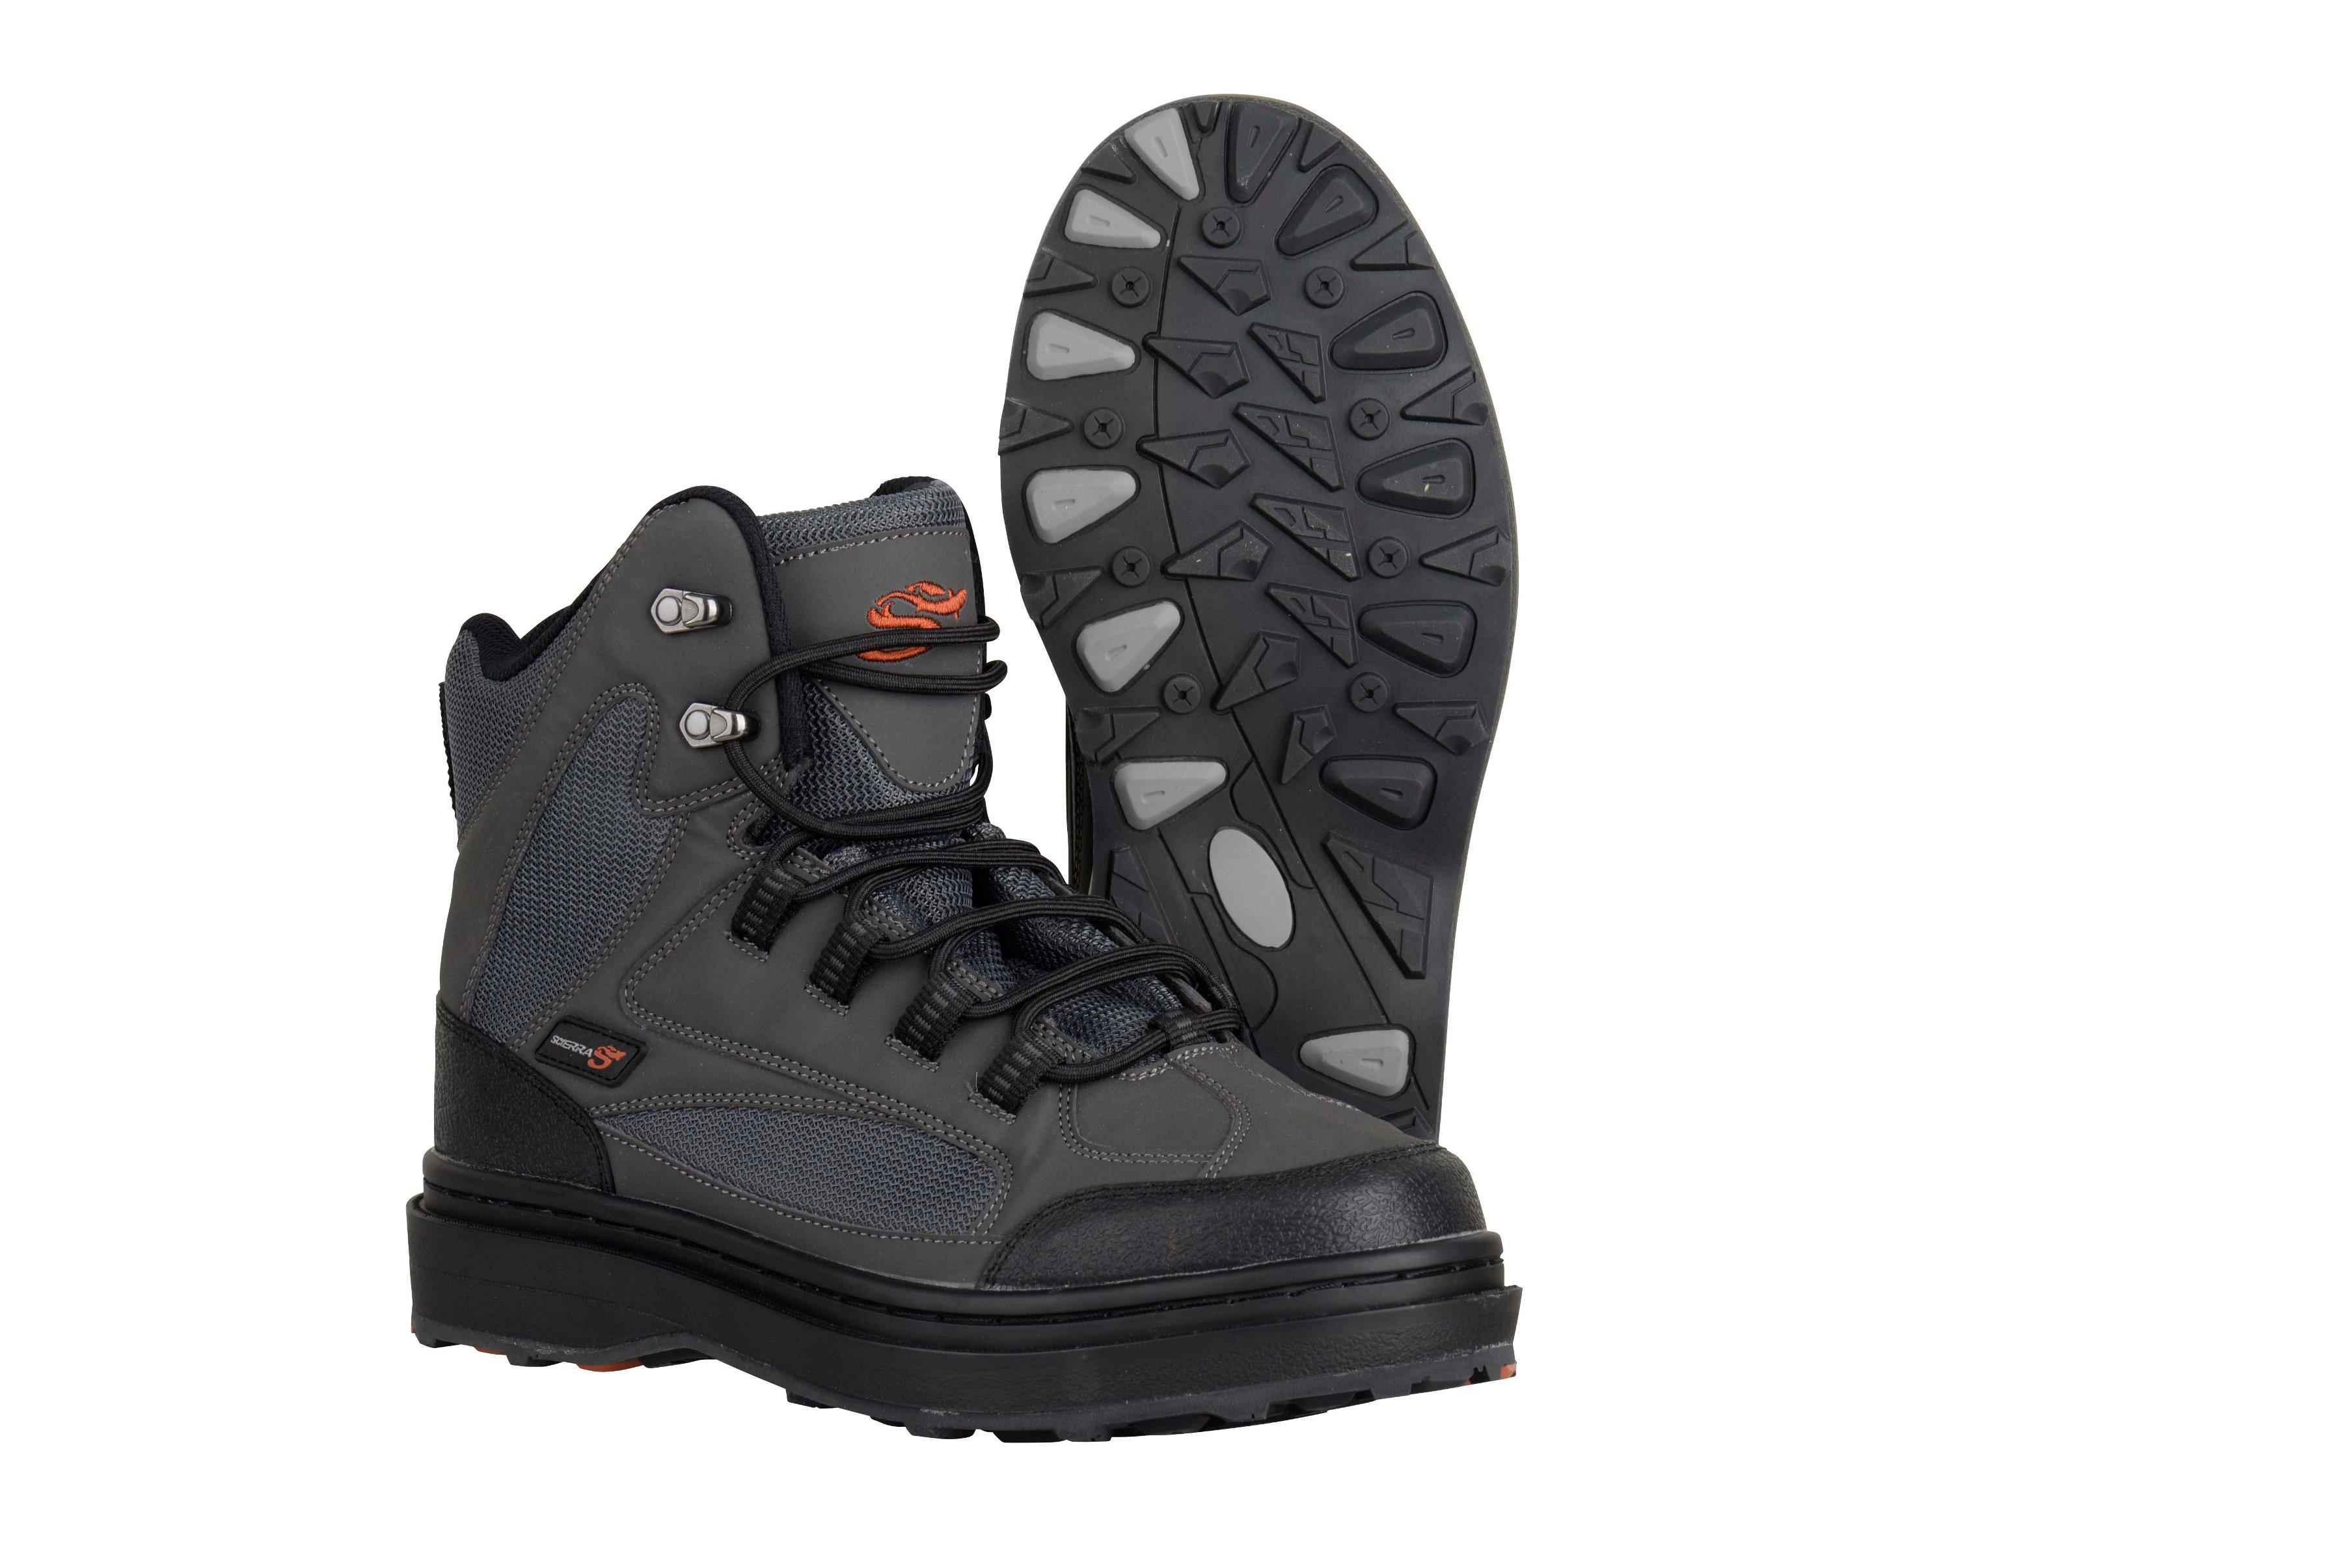 Scierra Tracer Wading scarpe cleated sole watschuh 44 profilo 40 41 42 43 44 watschuh 45 46 47 ab3e19